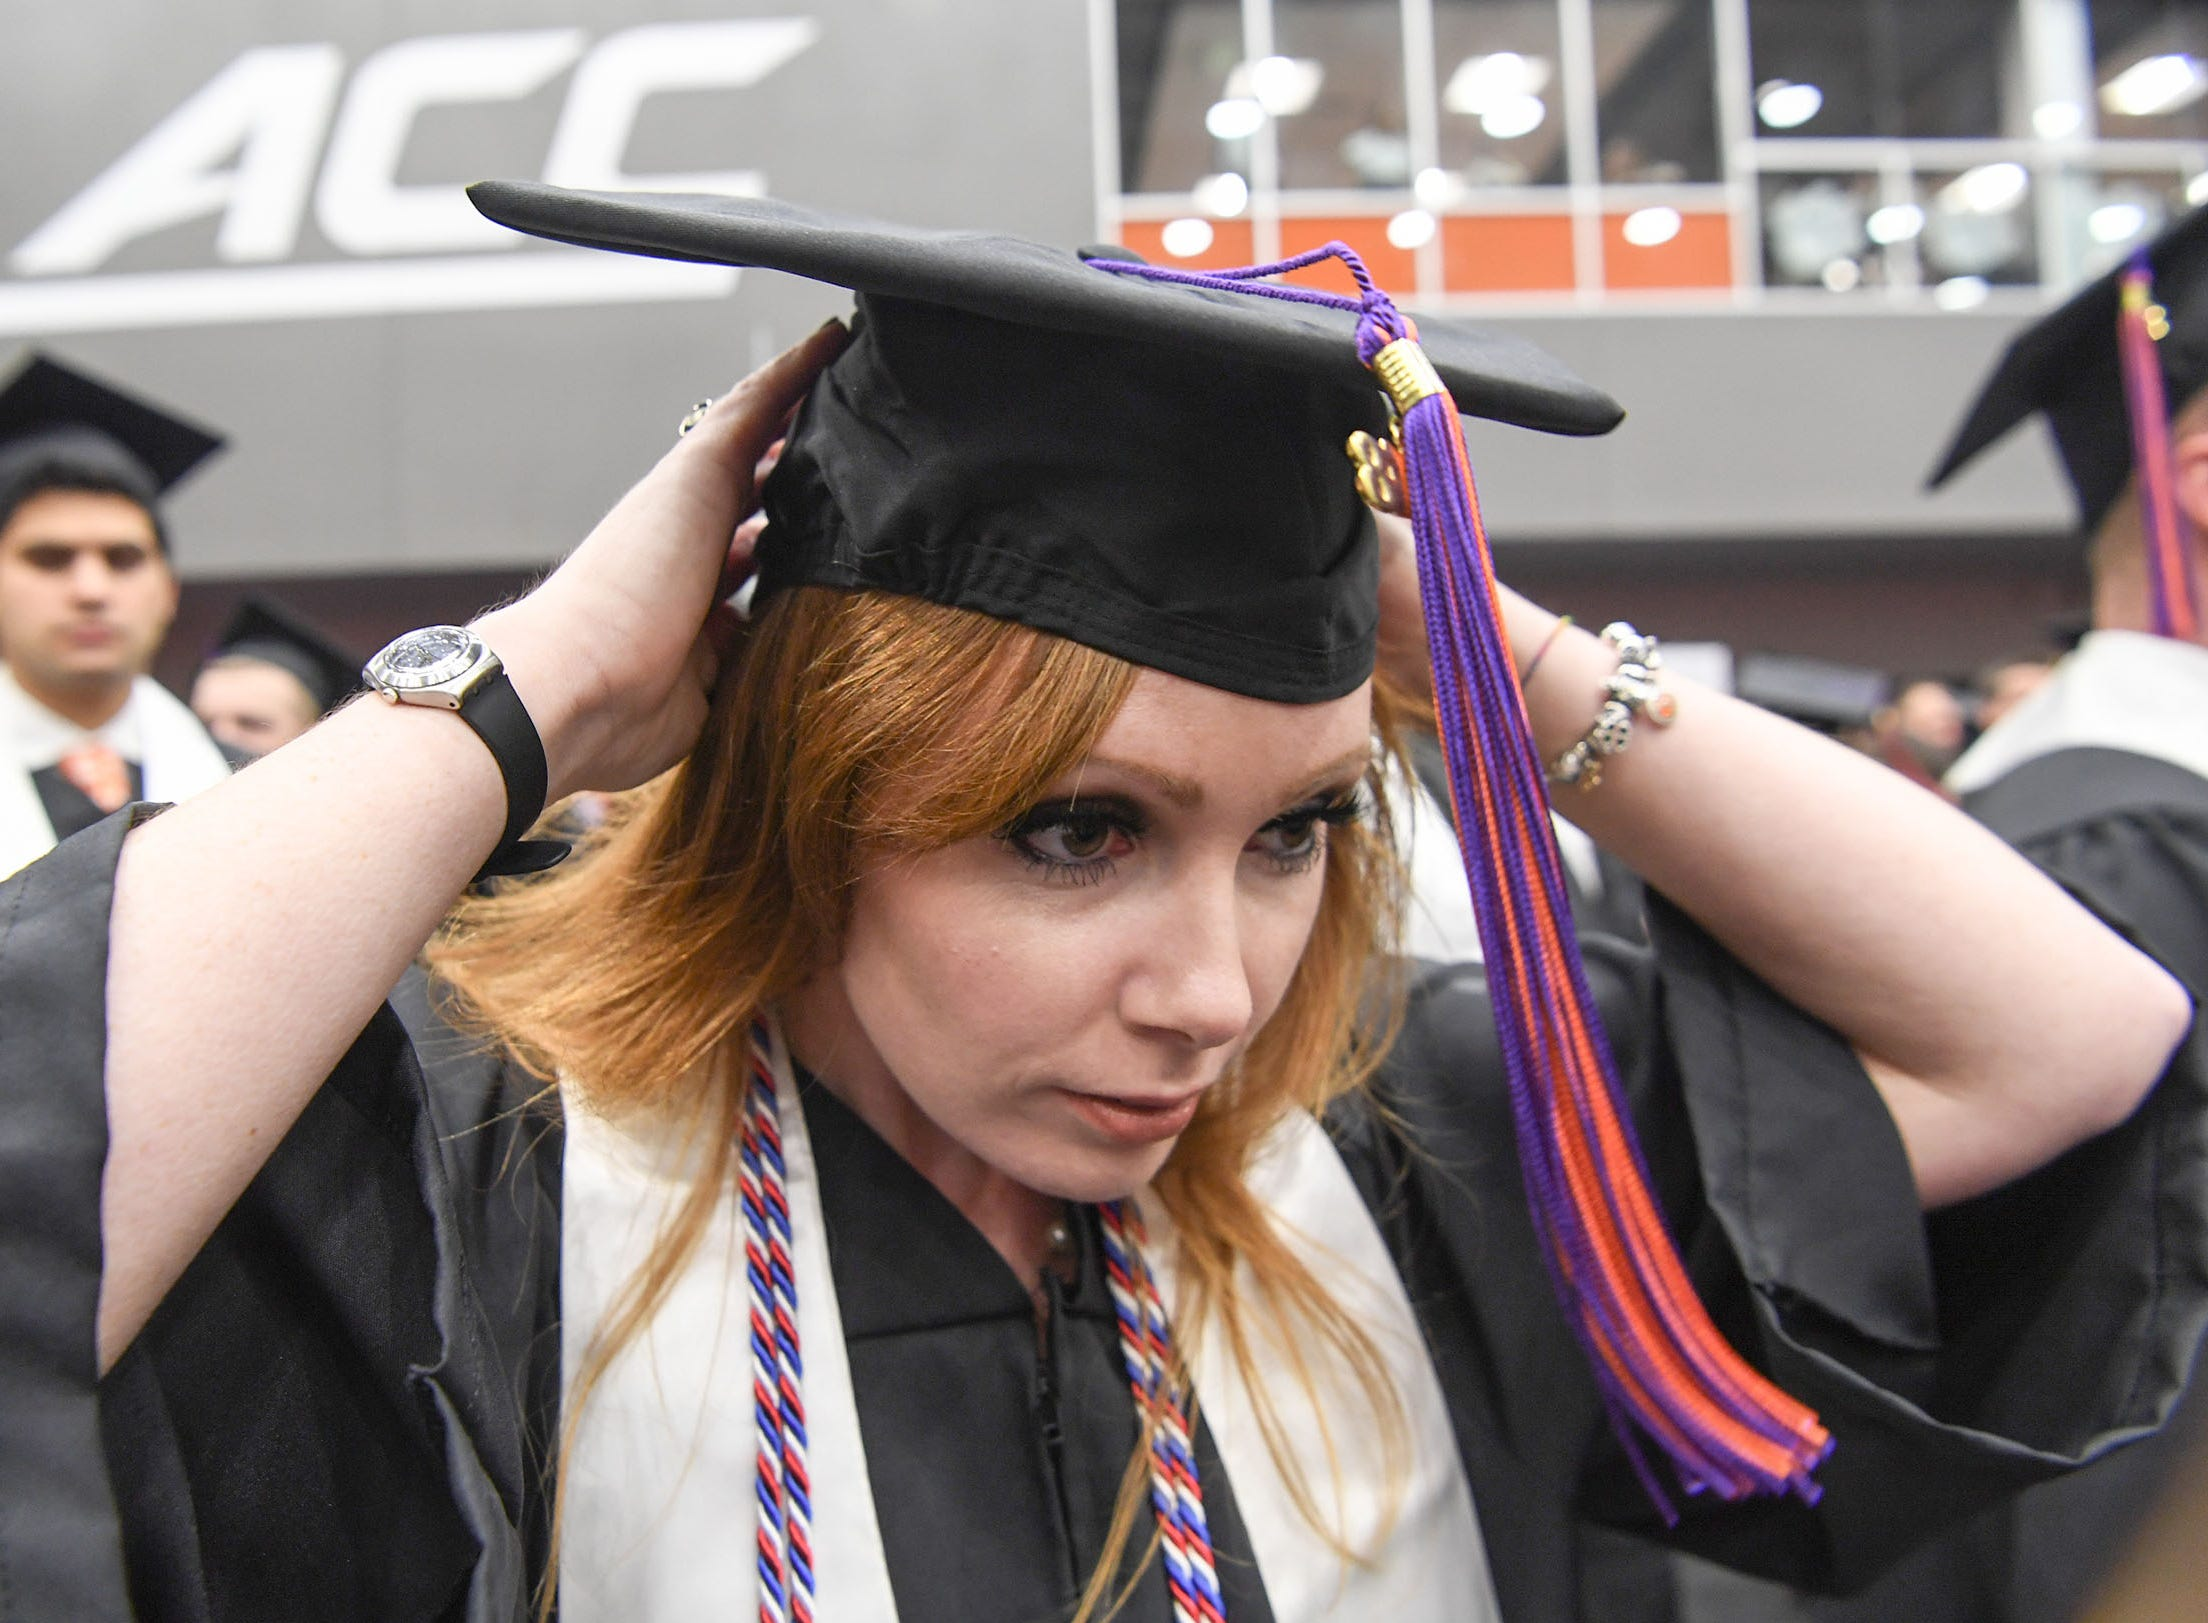 Amanda Nicks, psychology major, adjusts her cap before the Clemson University graduation ceremony Thursday morning in Littlejohn Coliseum in Clemson.